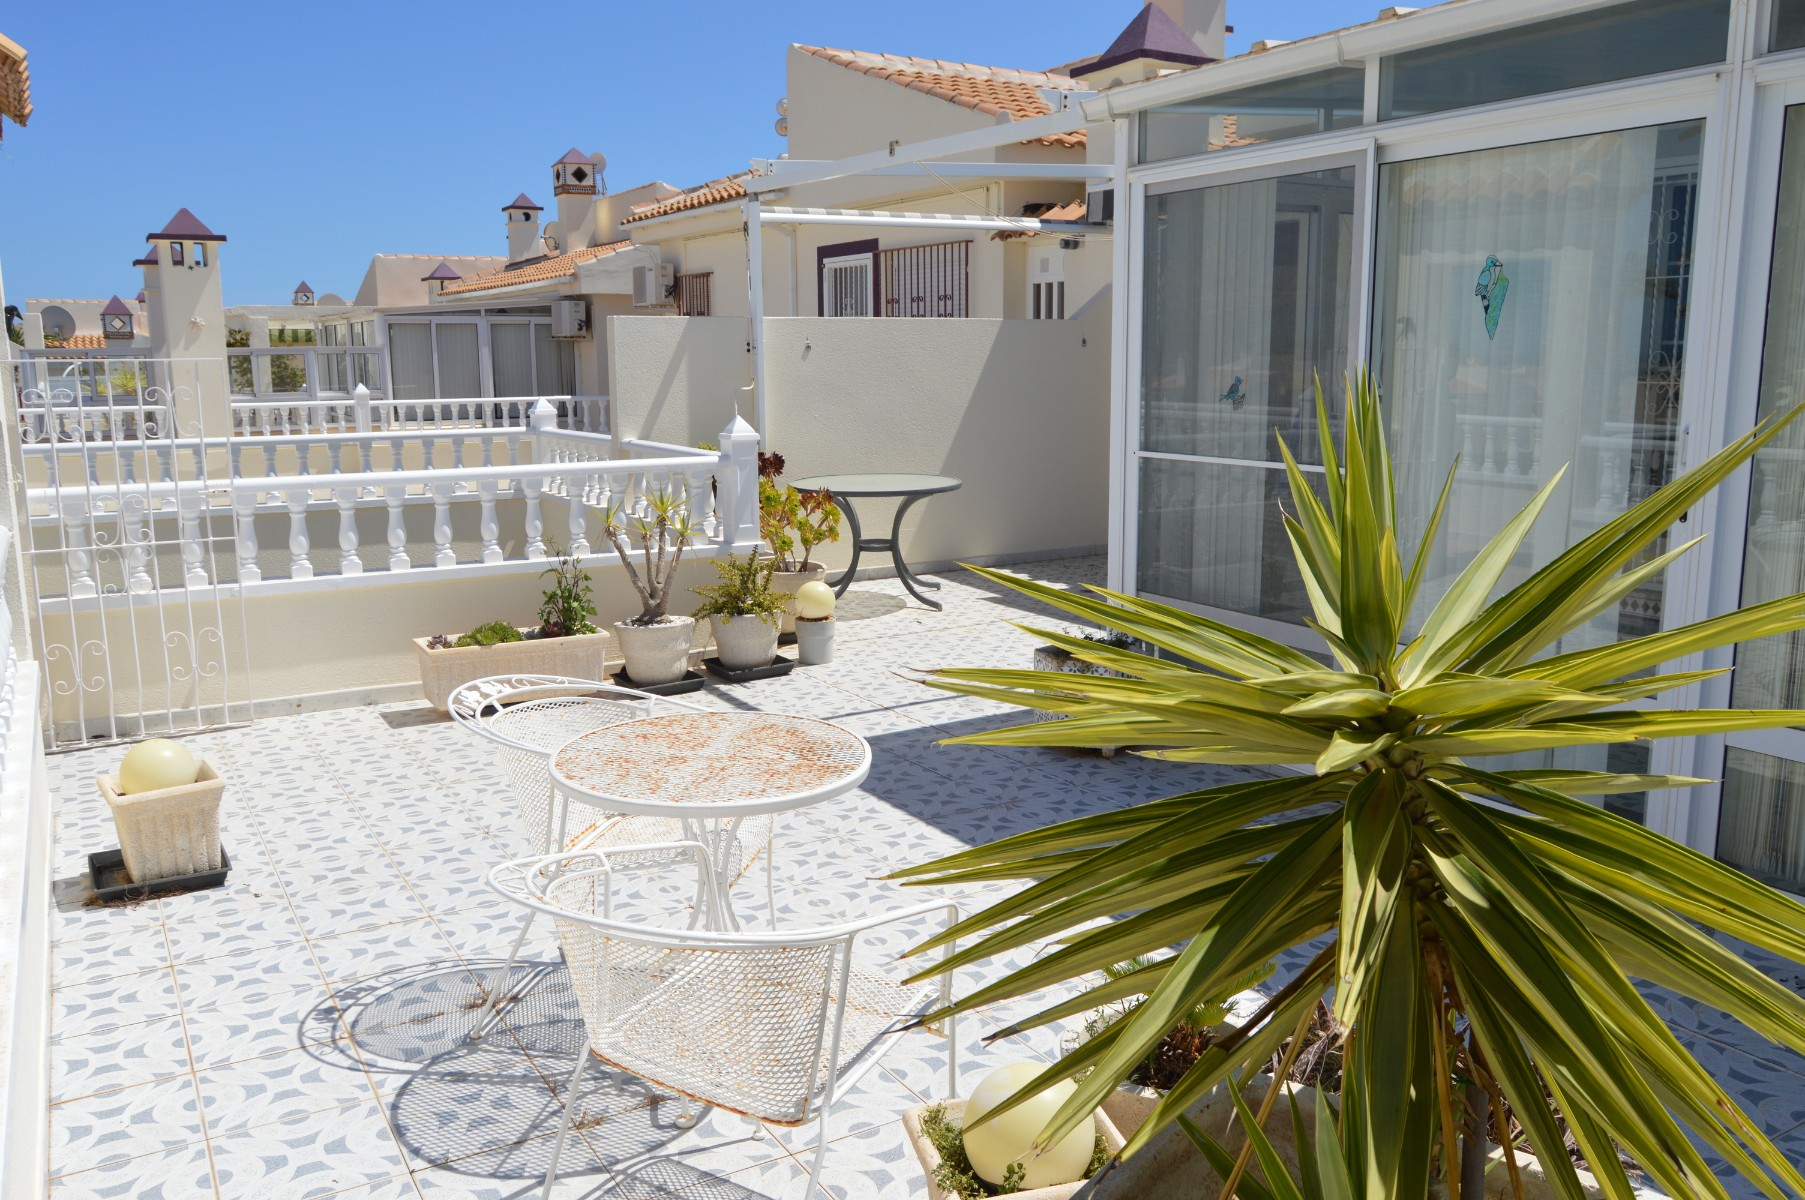 2 bedroom apartment / flat for sale in Orihuela Costa, Costa Blanca